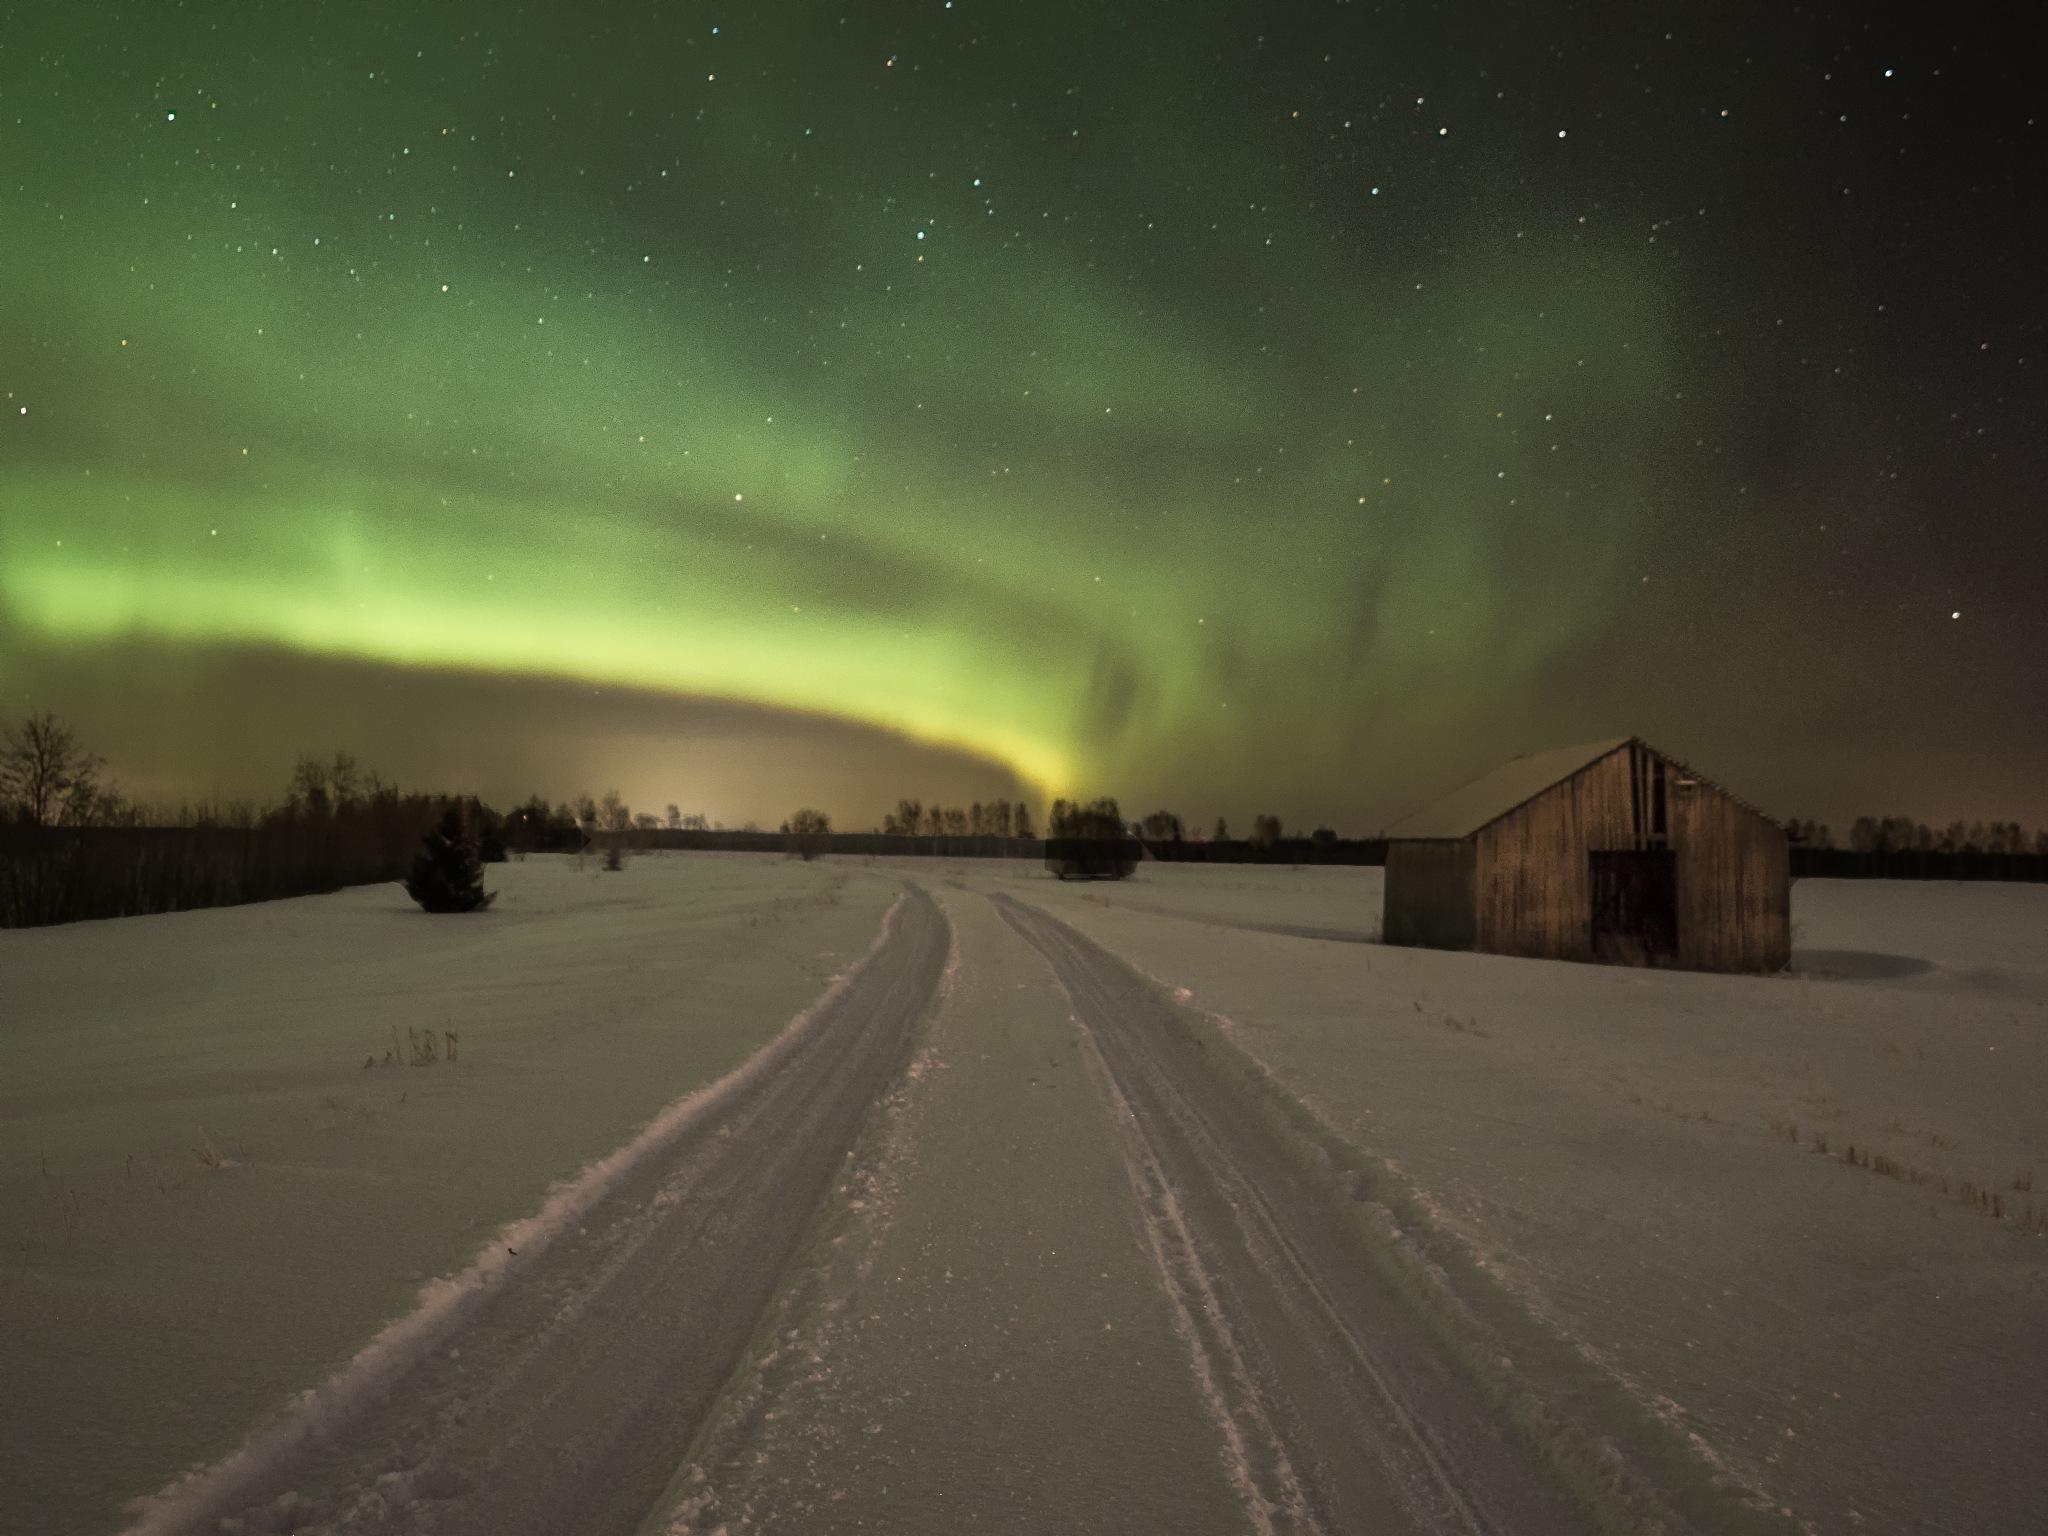 Winter night by Kari Aho